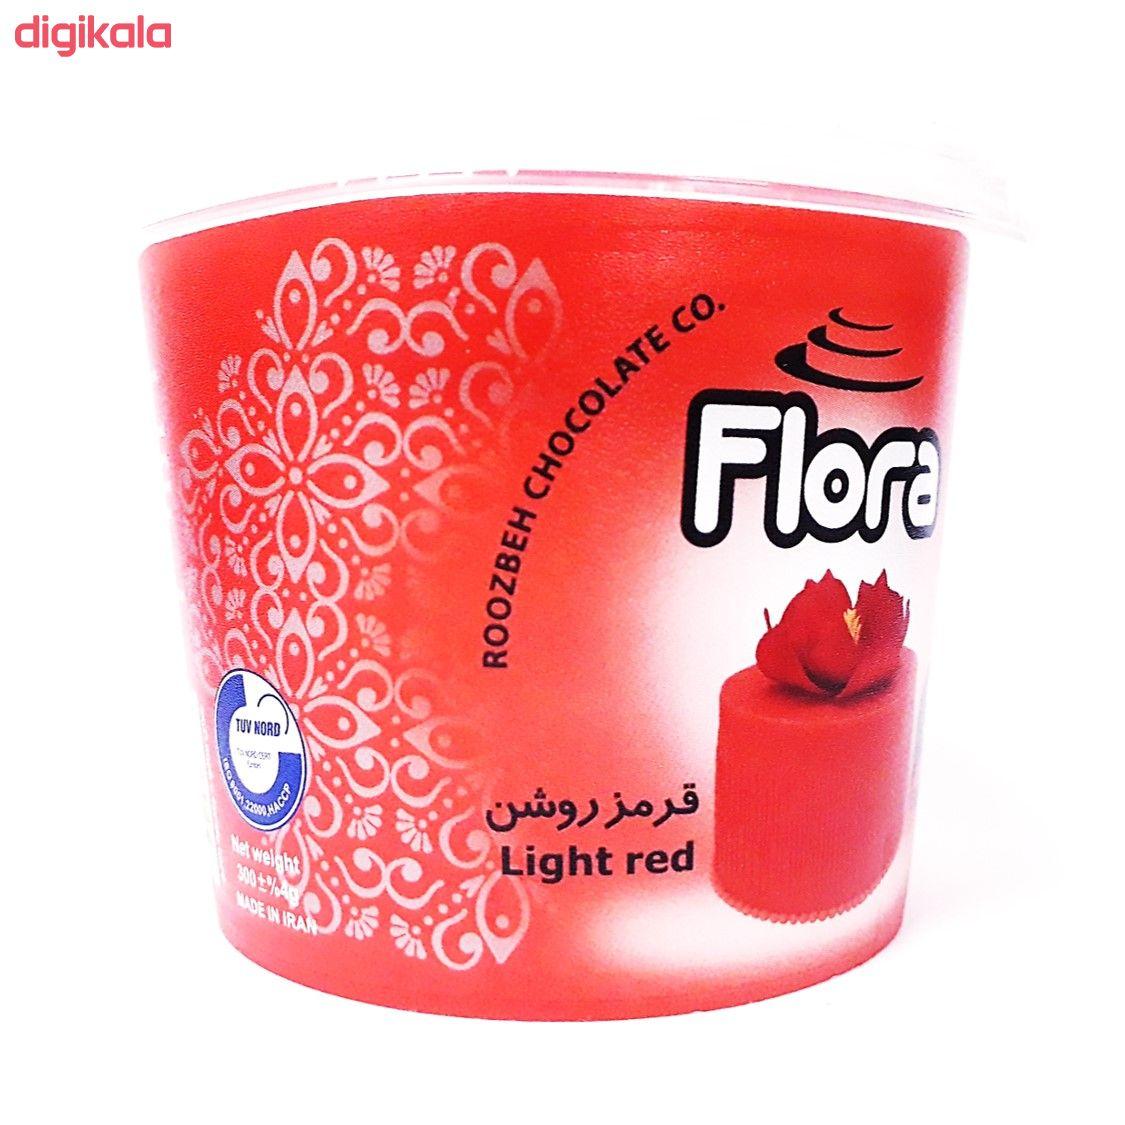 خمیر فوندانت قرمز روشن فلورا - 300 گرم main 1 1